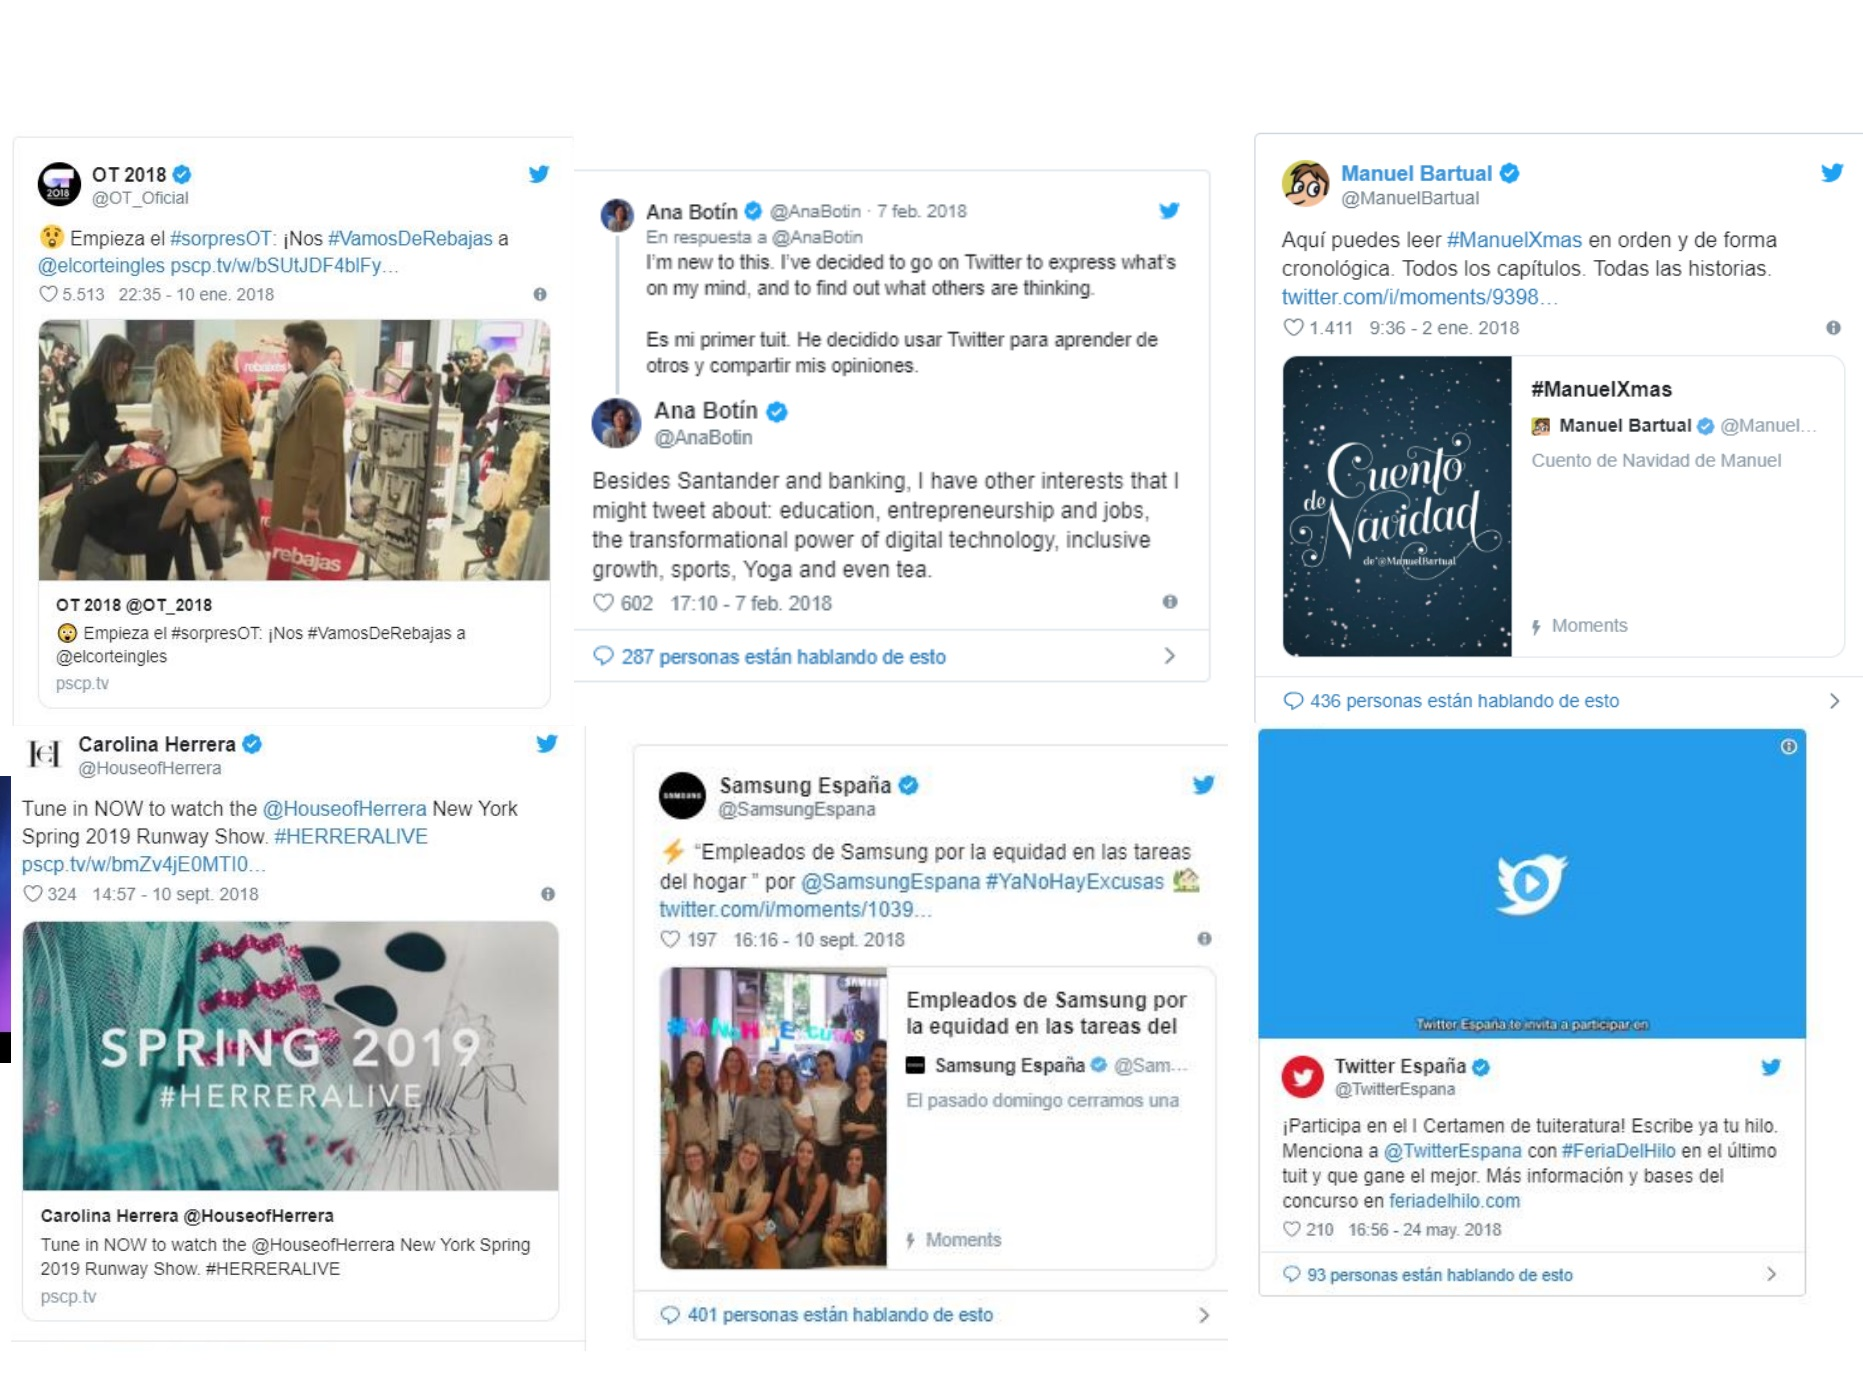 https://www.programapublicidad.com/wp-content/uploads/2018/12/2018-EstoSucedió-marcas-Twitter-programapublicidad-muy-grande.jpg